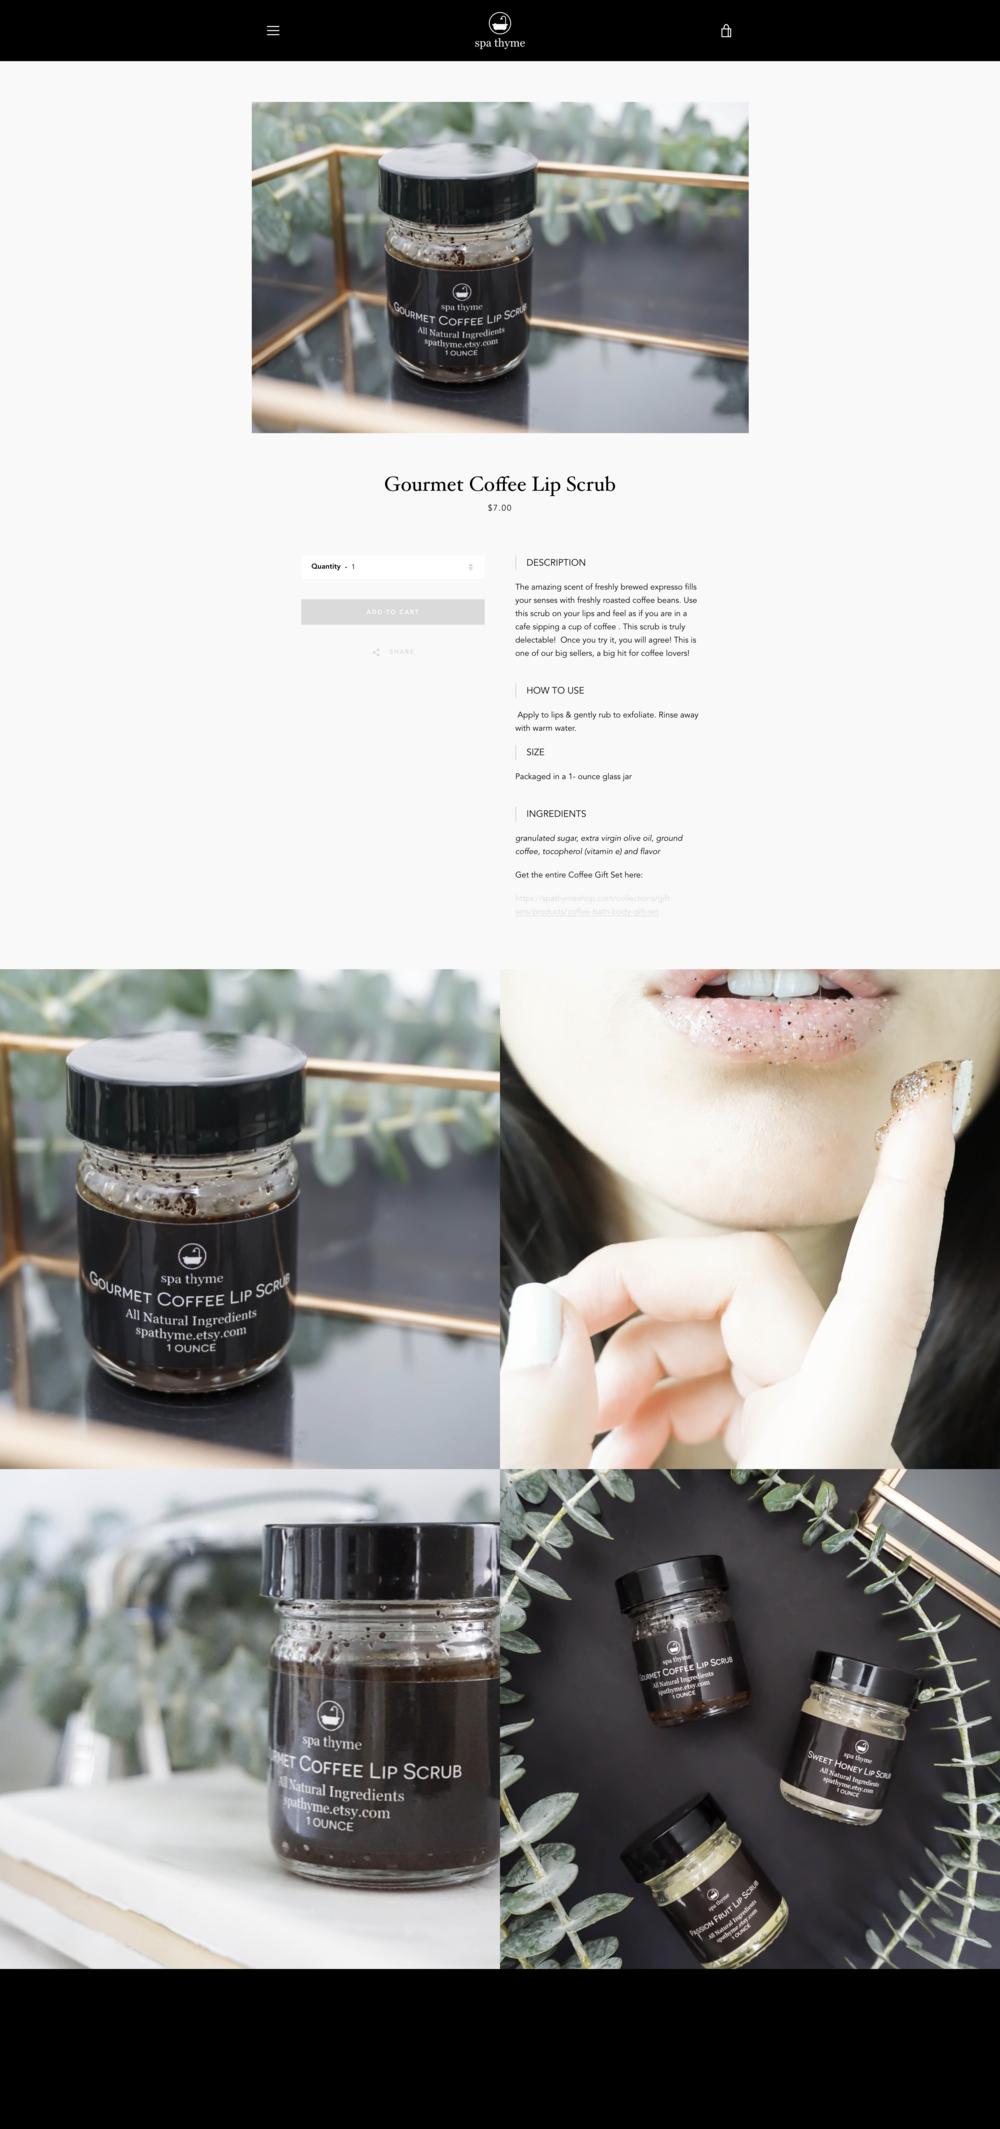 kristen-fulchi-design-studio-branding-photography-web-design-for-creatives-thoughtful-design-miami-brand-designer-for-creative-women-entrepreneurs-custom-shopify-squarespace-websites3.png